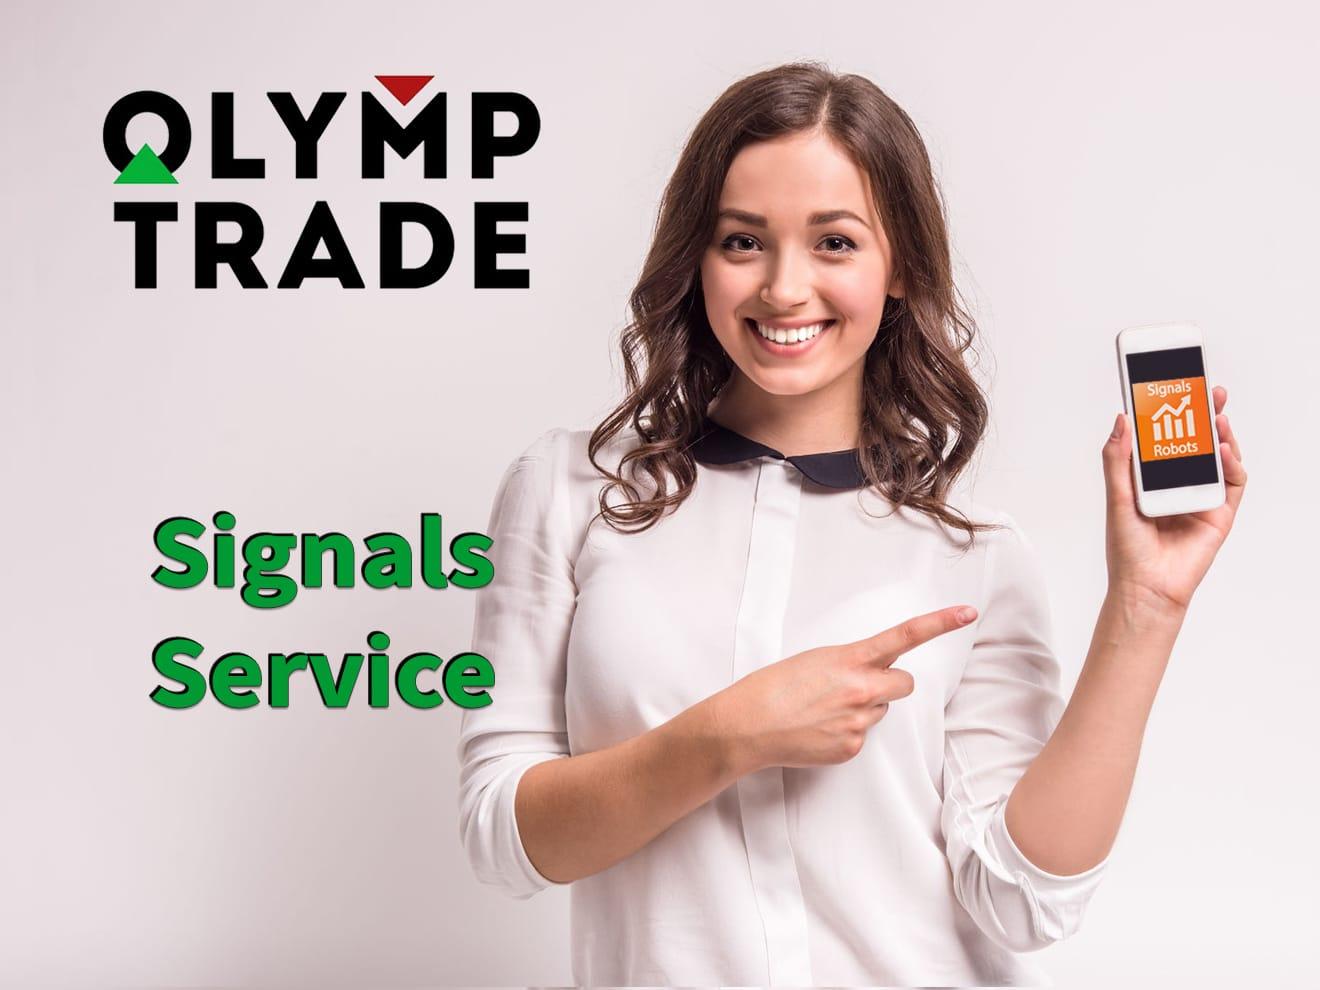 Olymp Trade Signals